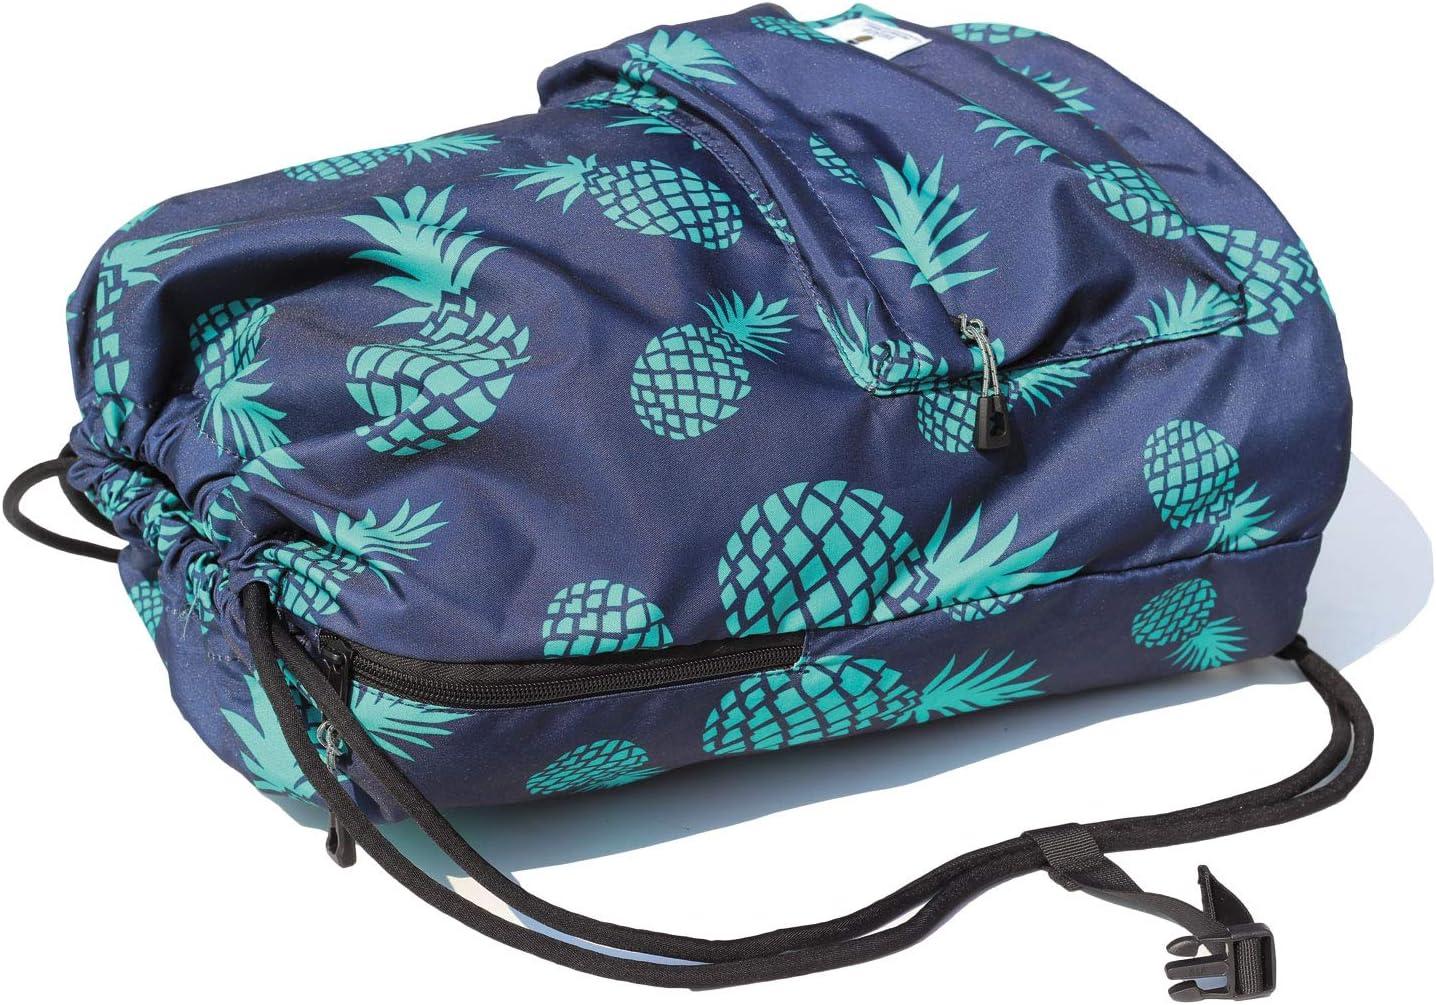 Powder Room Stripes Drawstring Backpack Sports Athletic Gym Cinch Sack String Storage Bags for Hiking Travel Beach